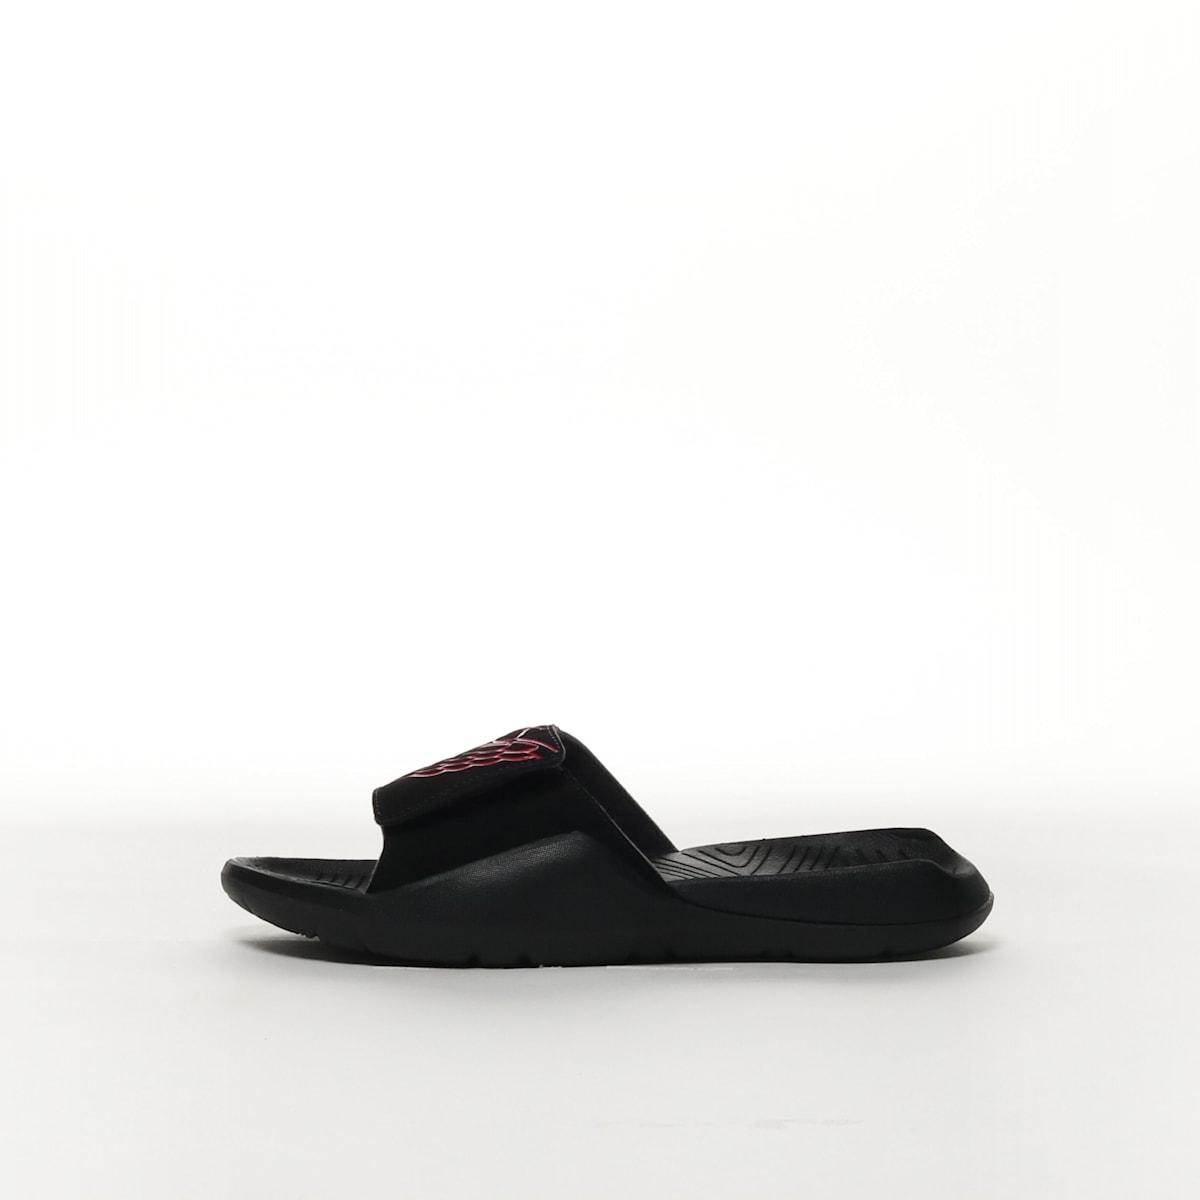 64d8339b2416 Jordan Hydro 7 - BLACK BLACK BLACK UNIVERSITY RED – Resku